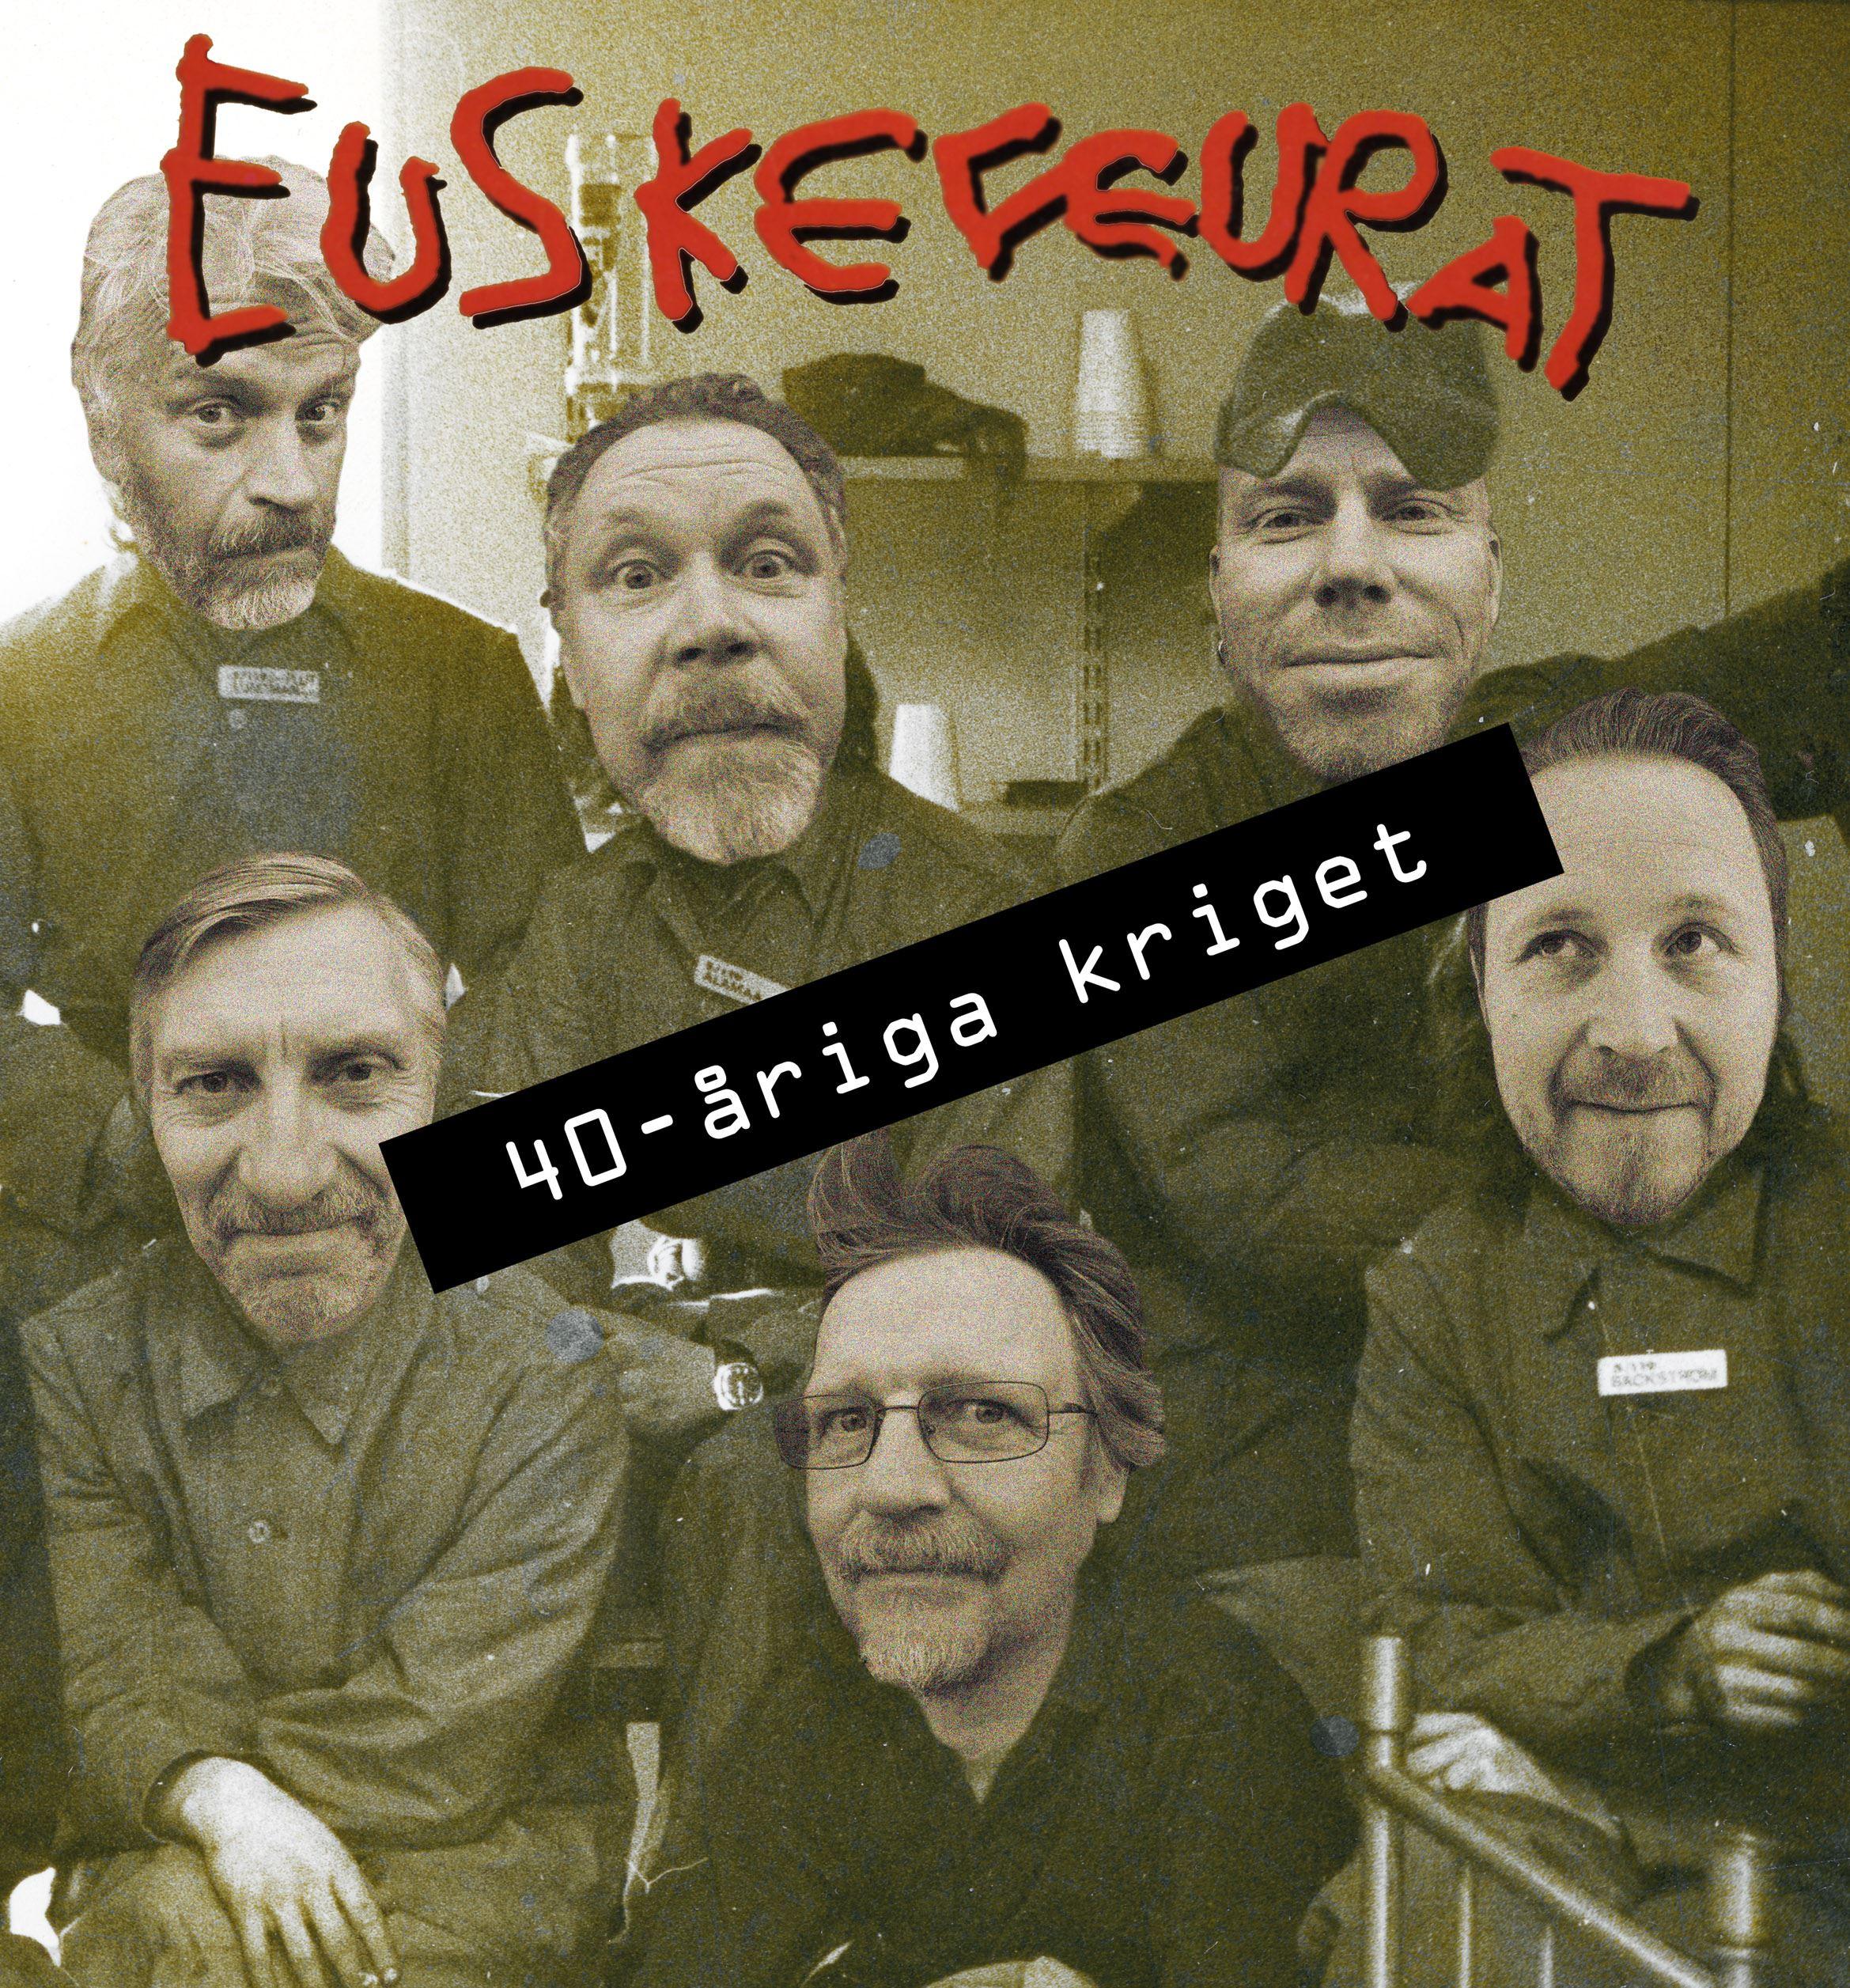 Foto: Euskefeurat,  © Copy: Euskefeurat, Euskefeurat - 40 åriga kriget